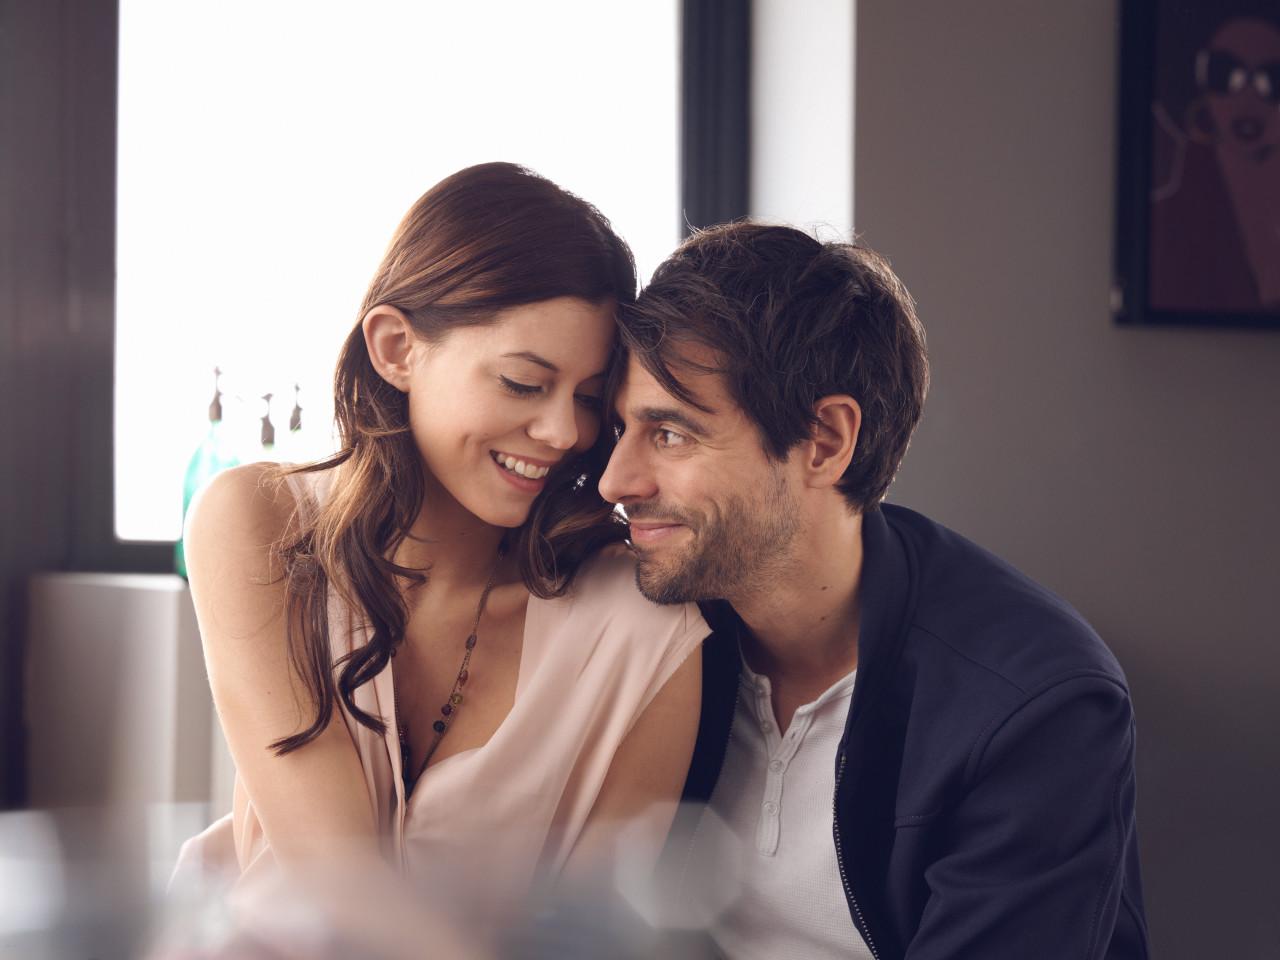 Frau ber 40 partnersuche. Flirt kostenlos ziersdorf